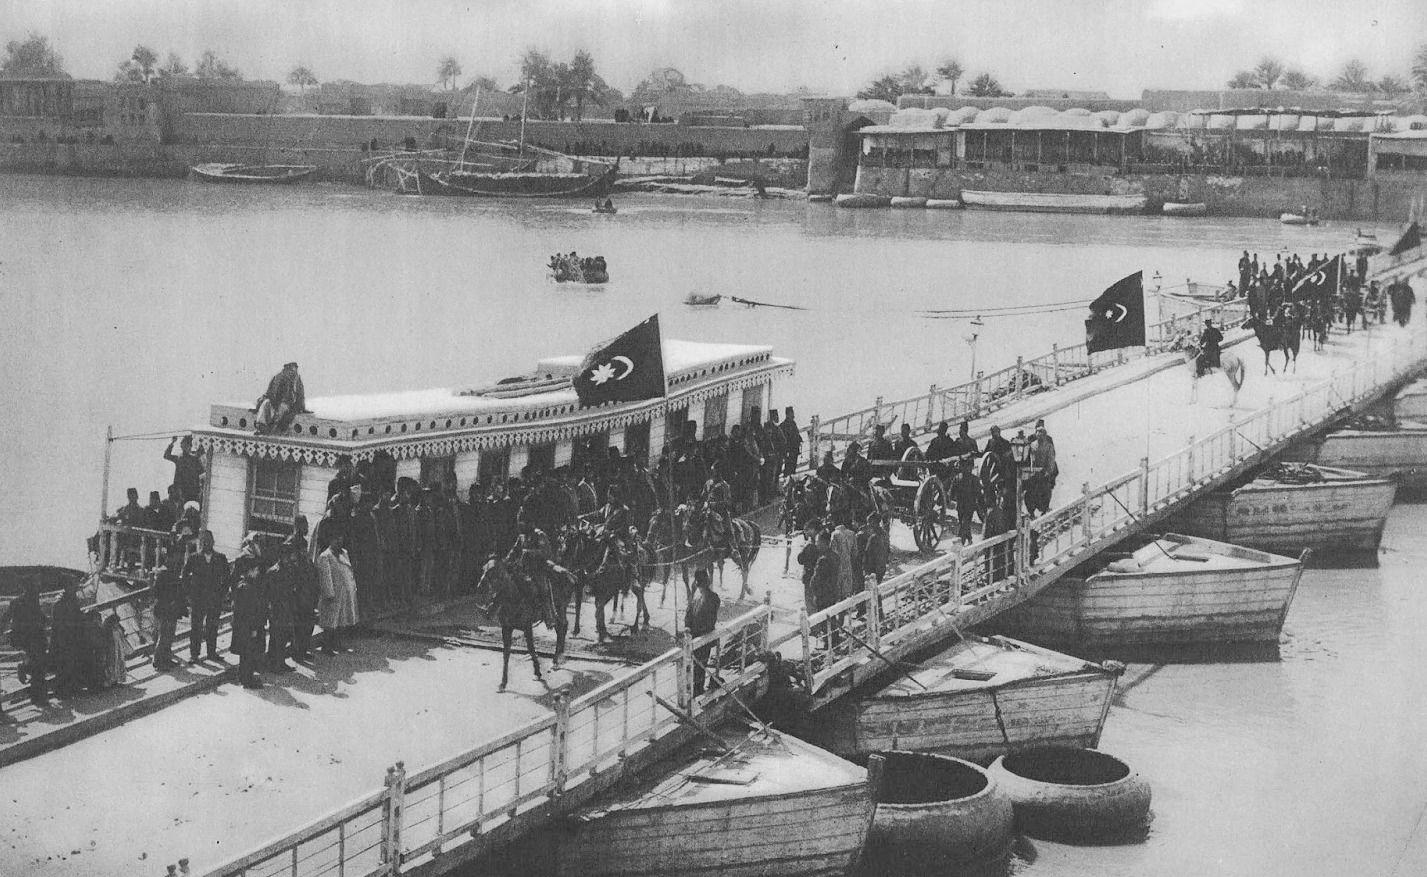 Dicle Nehri Manzarasi Irak 2020 Parthenon Bagdat Resimler